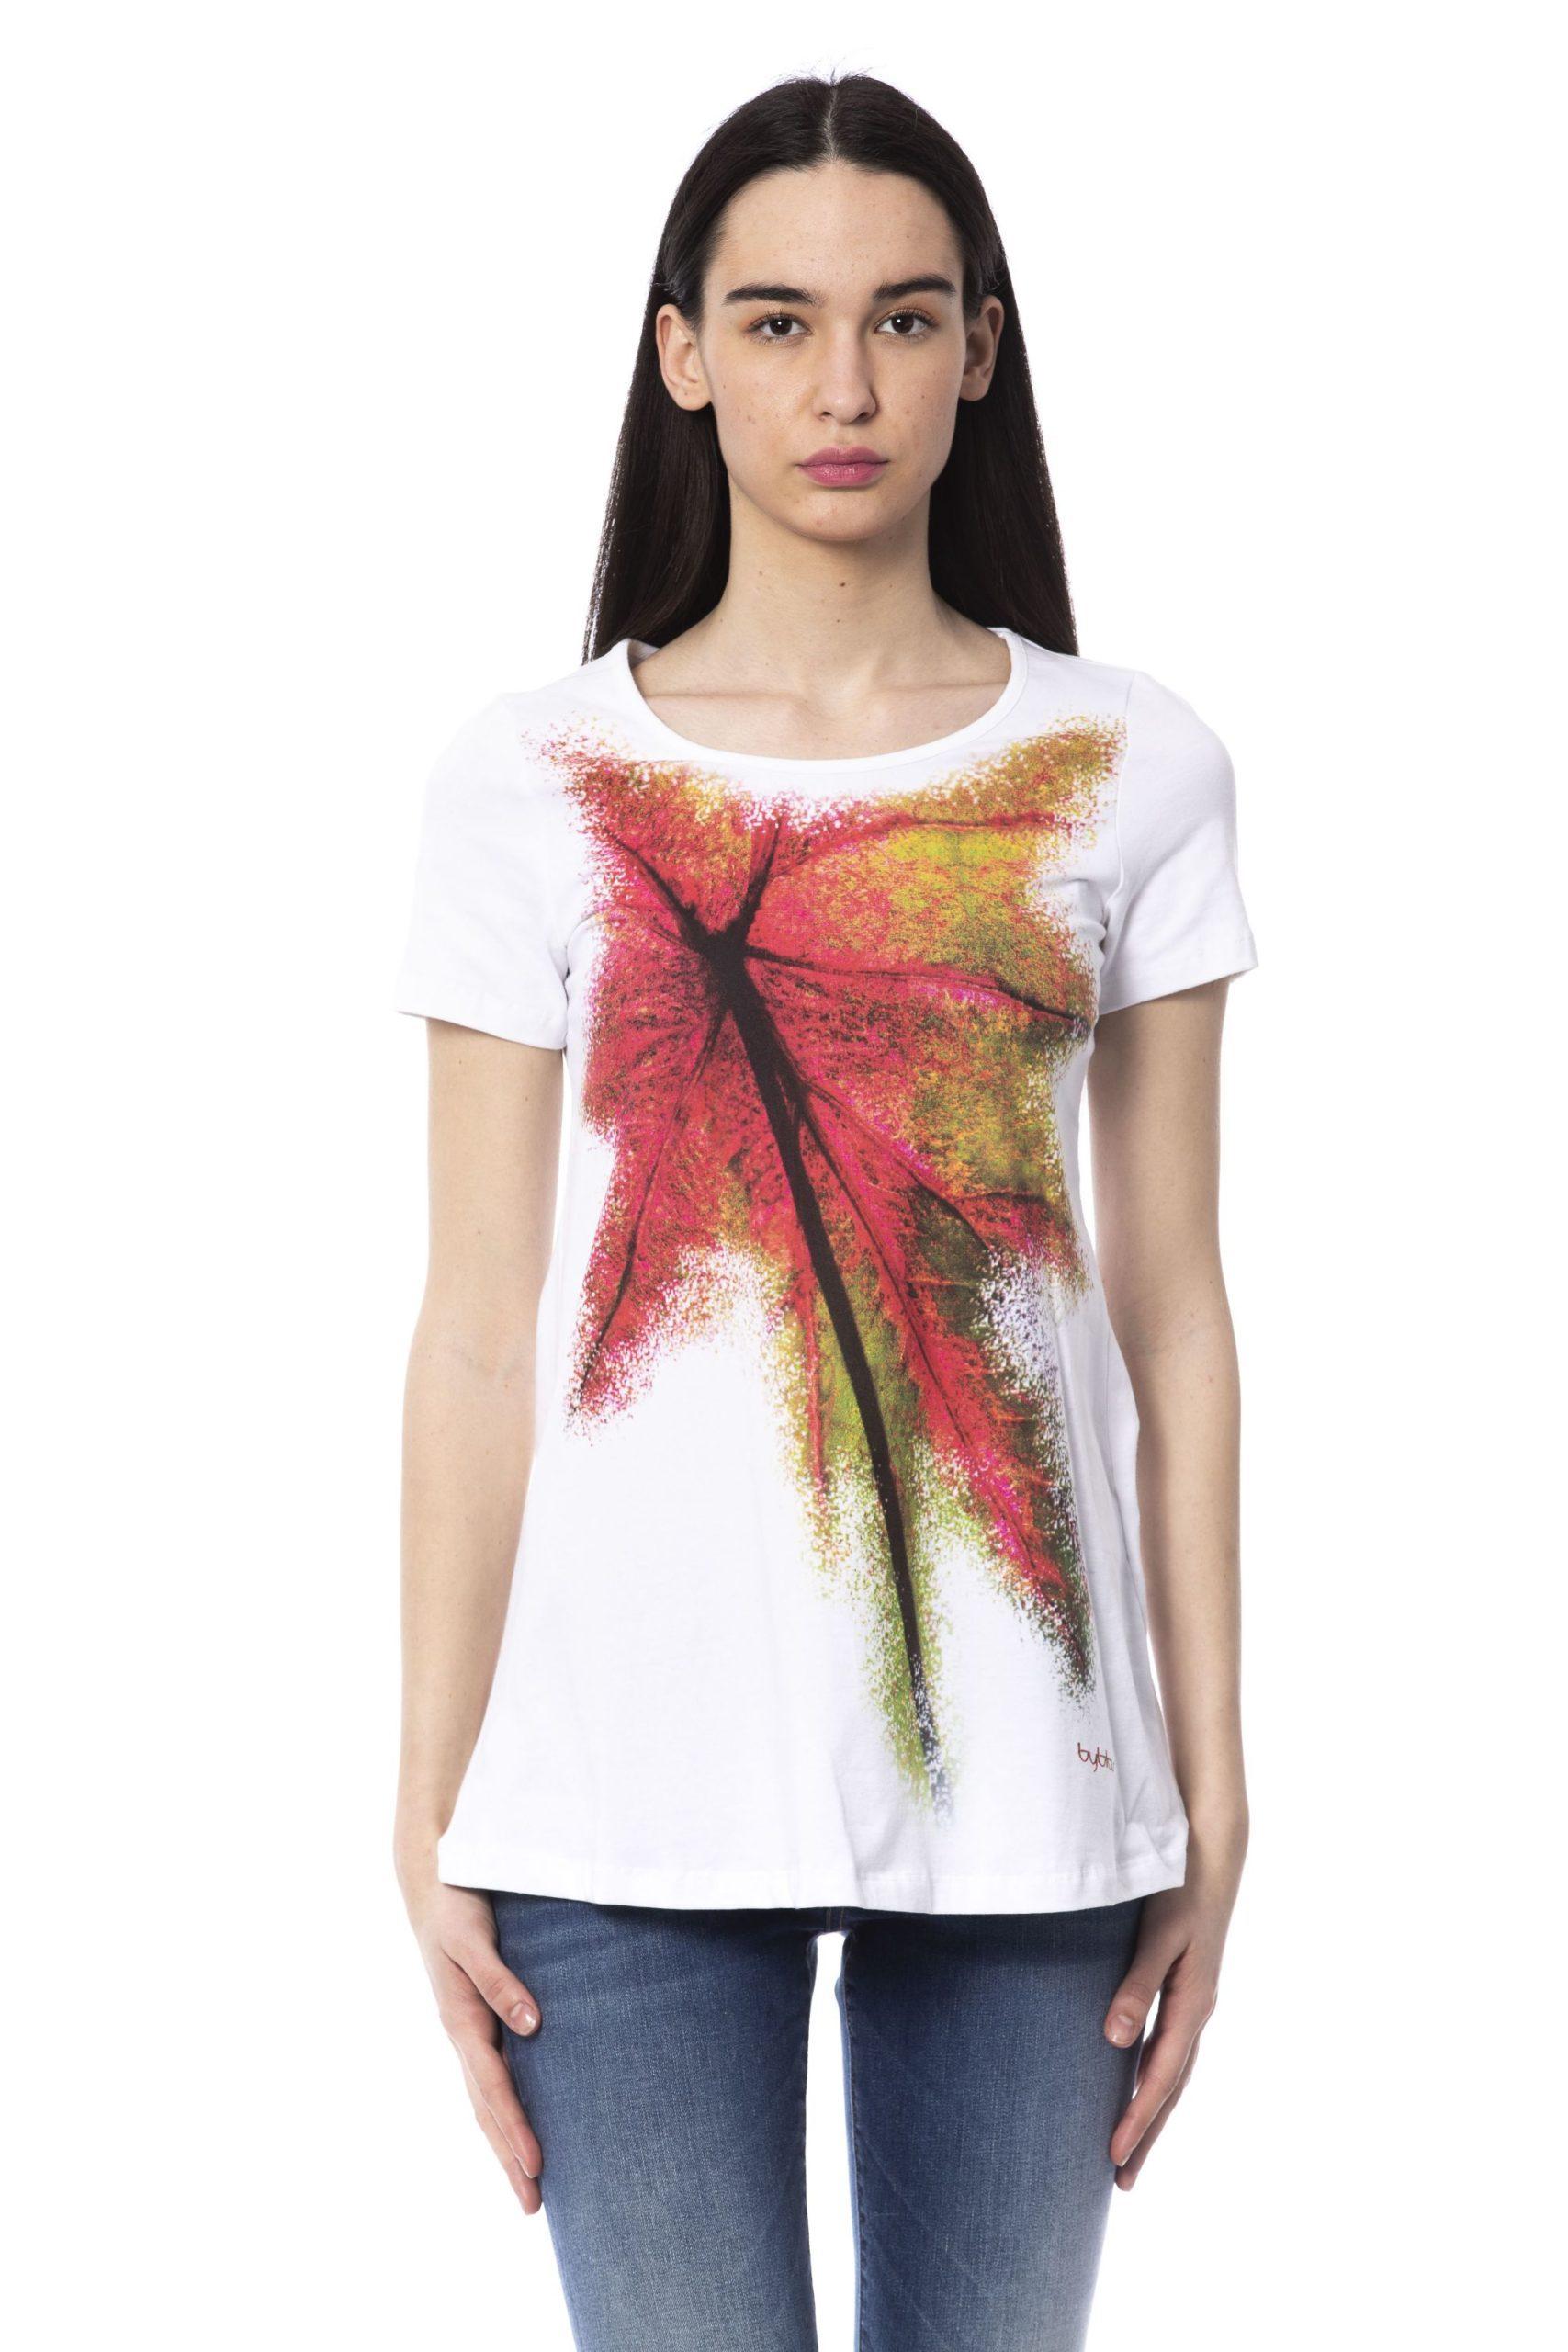 BYBLOS Women's Gtb T-Shirt White BY1234710 - S